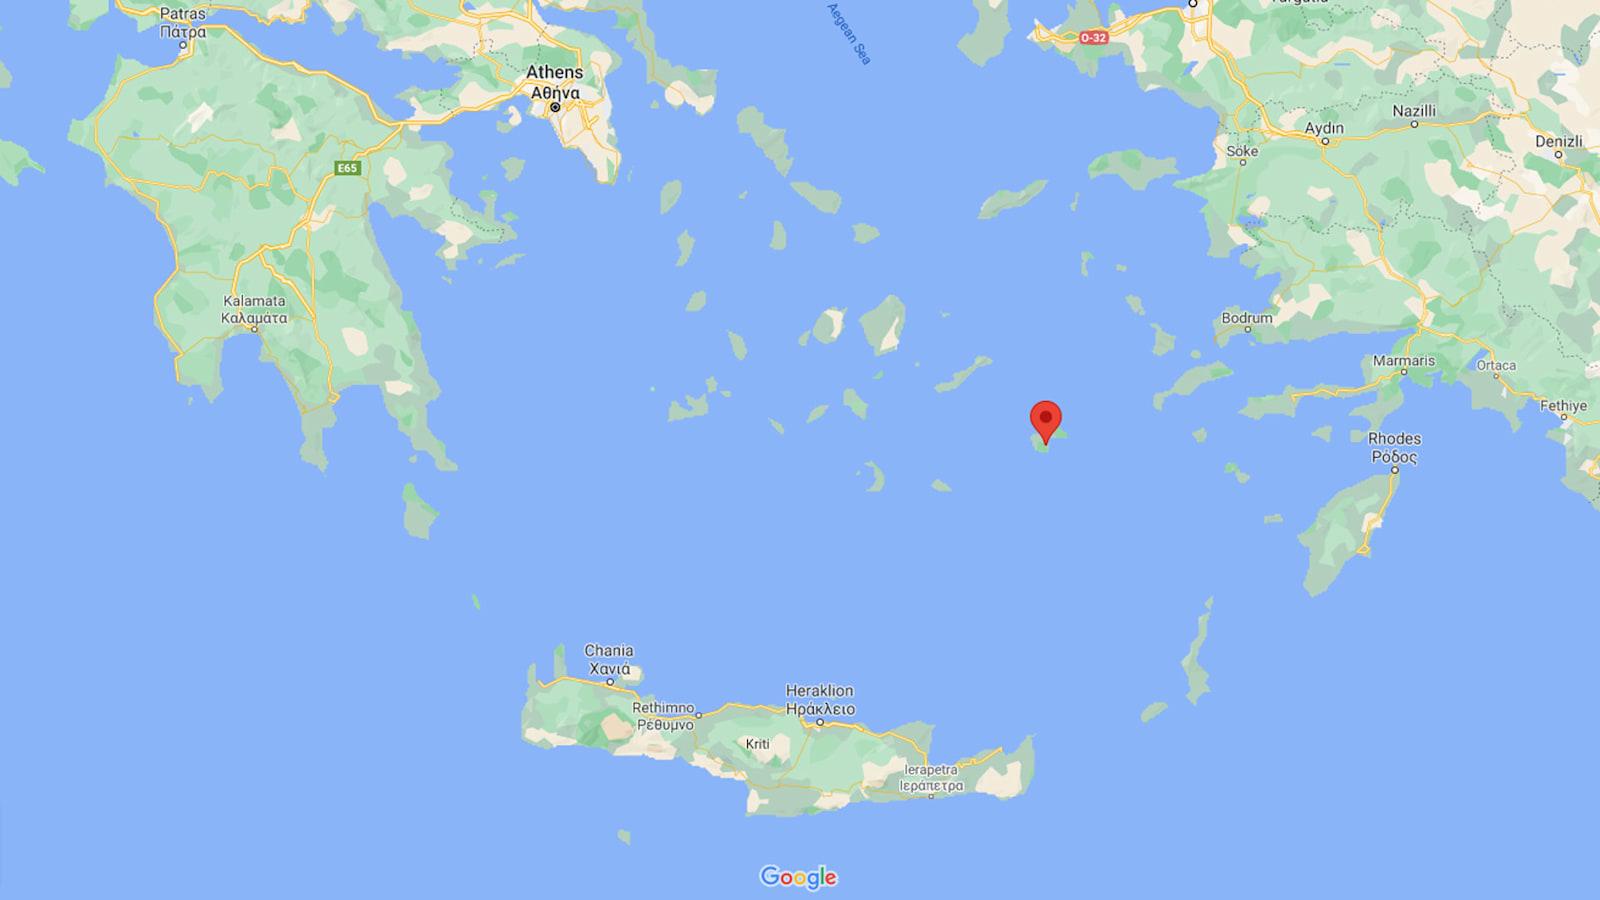 Volkswagen provides 8 ID4s to Greek island seeking to go environment-friendly